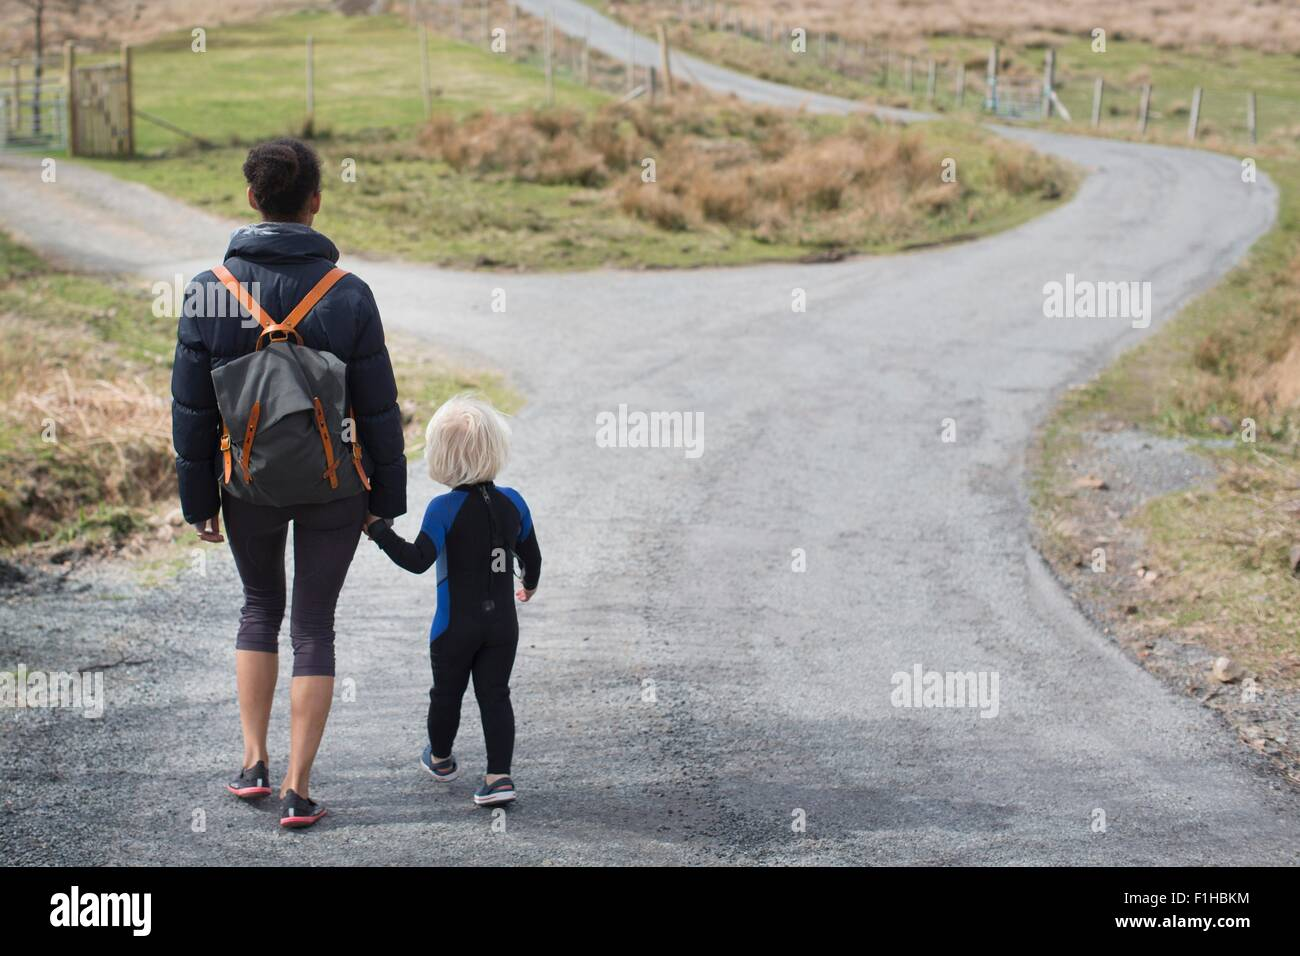 Madre e hijo caminando sobre country road tomados de las manos, vista trasera Foto de stock